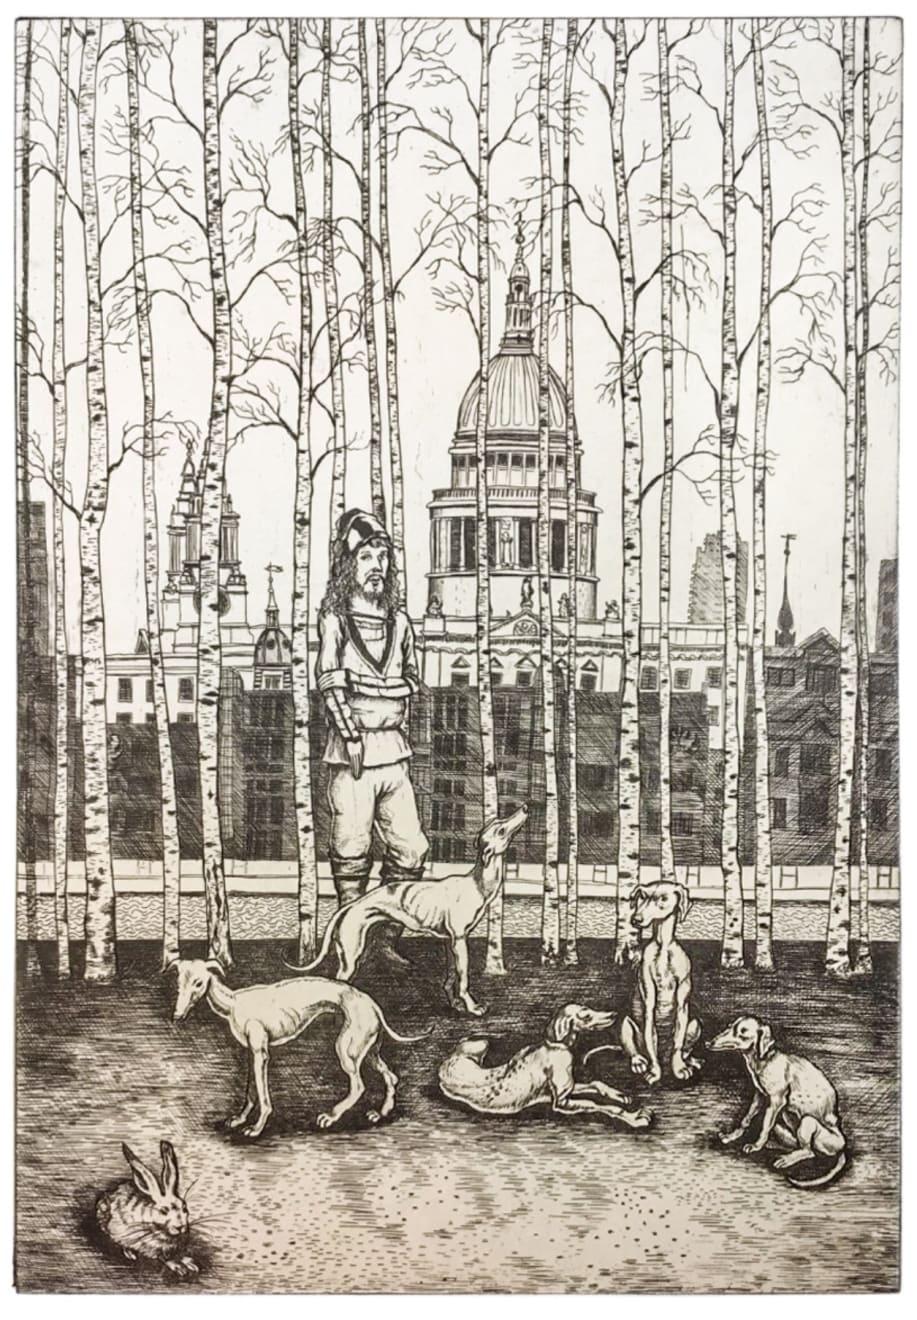 Mychael Barratt, Dürer on the South Bank, 2020